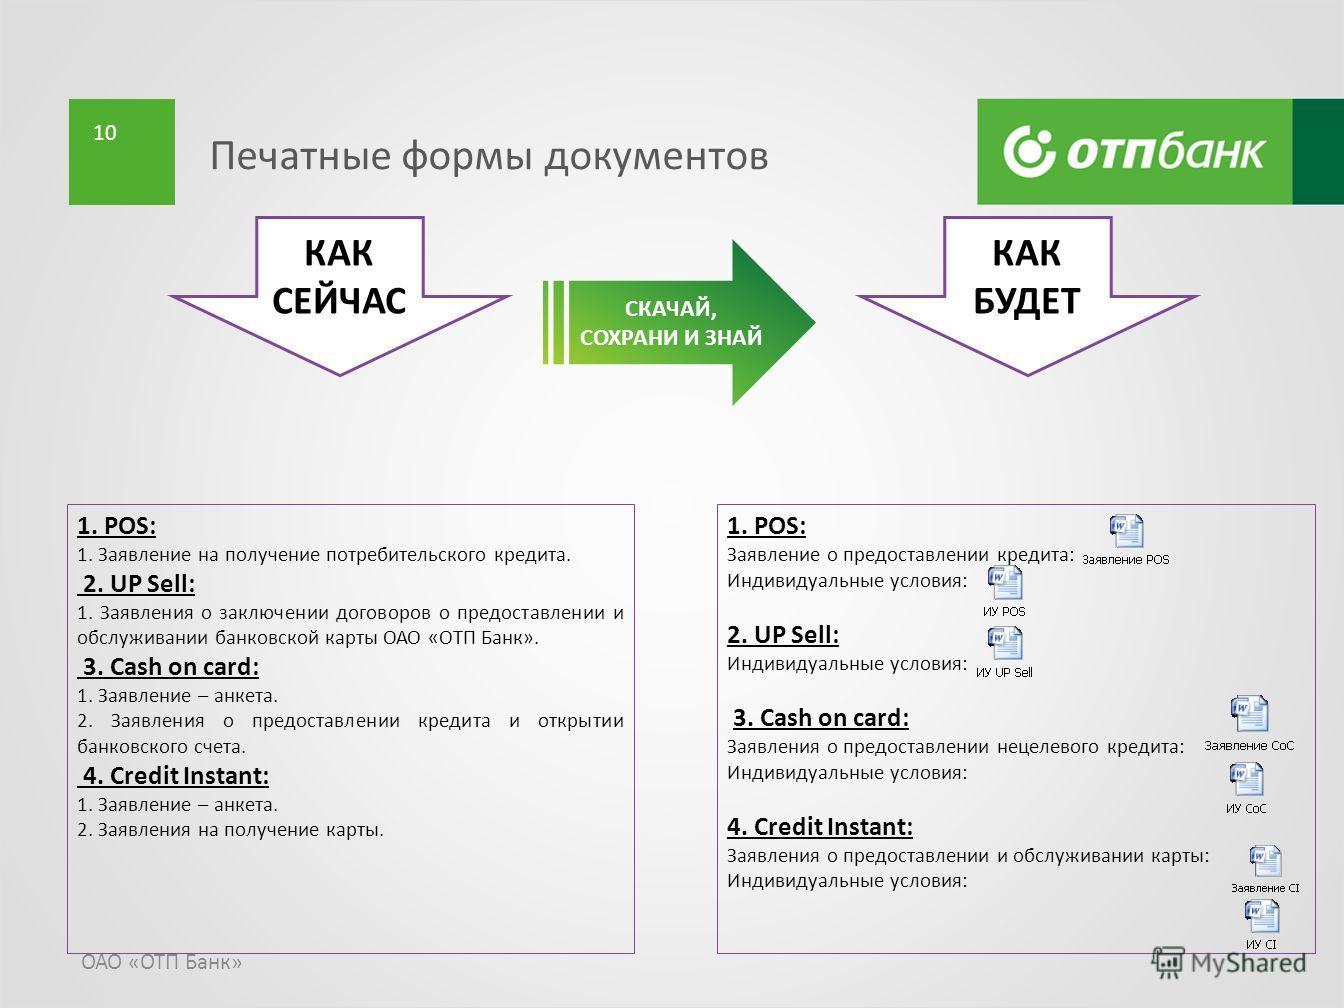 Кредитный калькулятор банка Ренессанс Кредит Банк